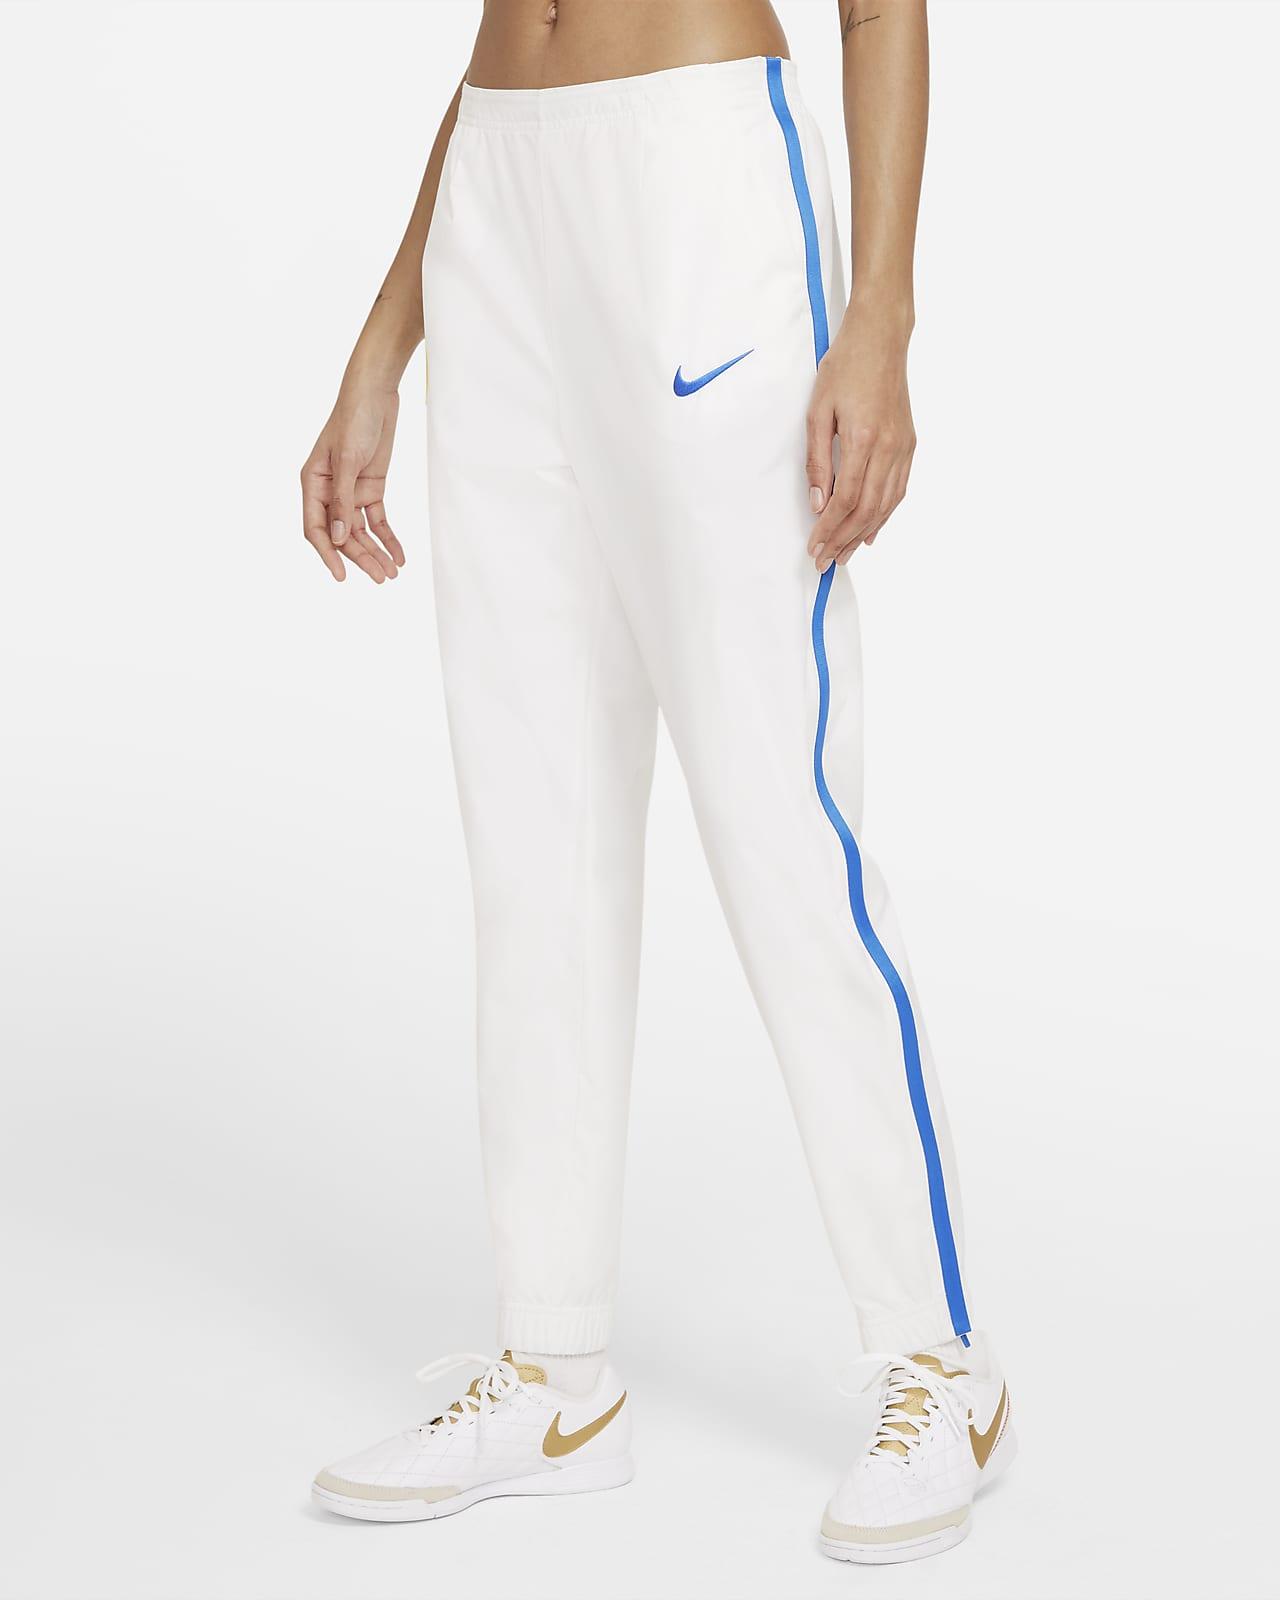 Pantaloni da calcio Inter - Donna. Nike IT